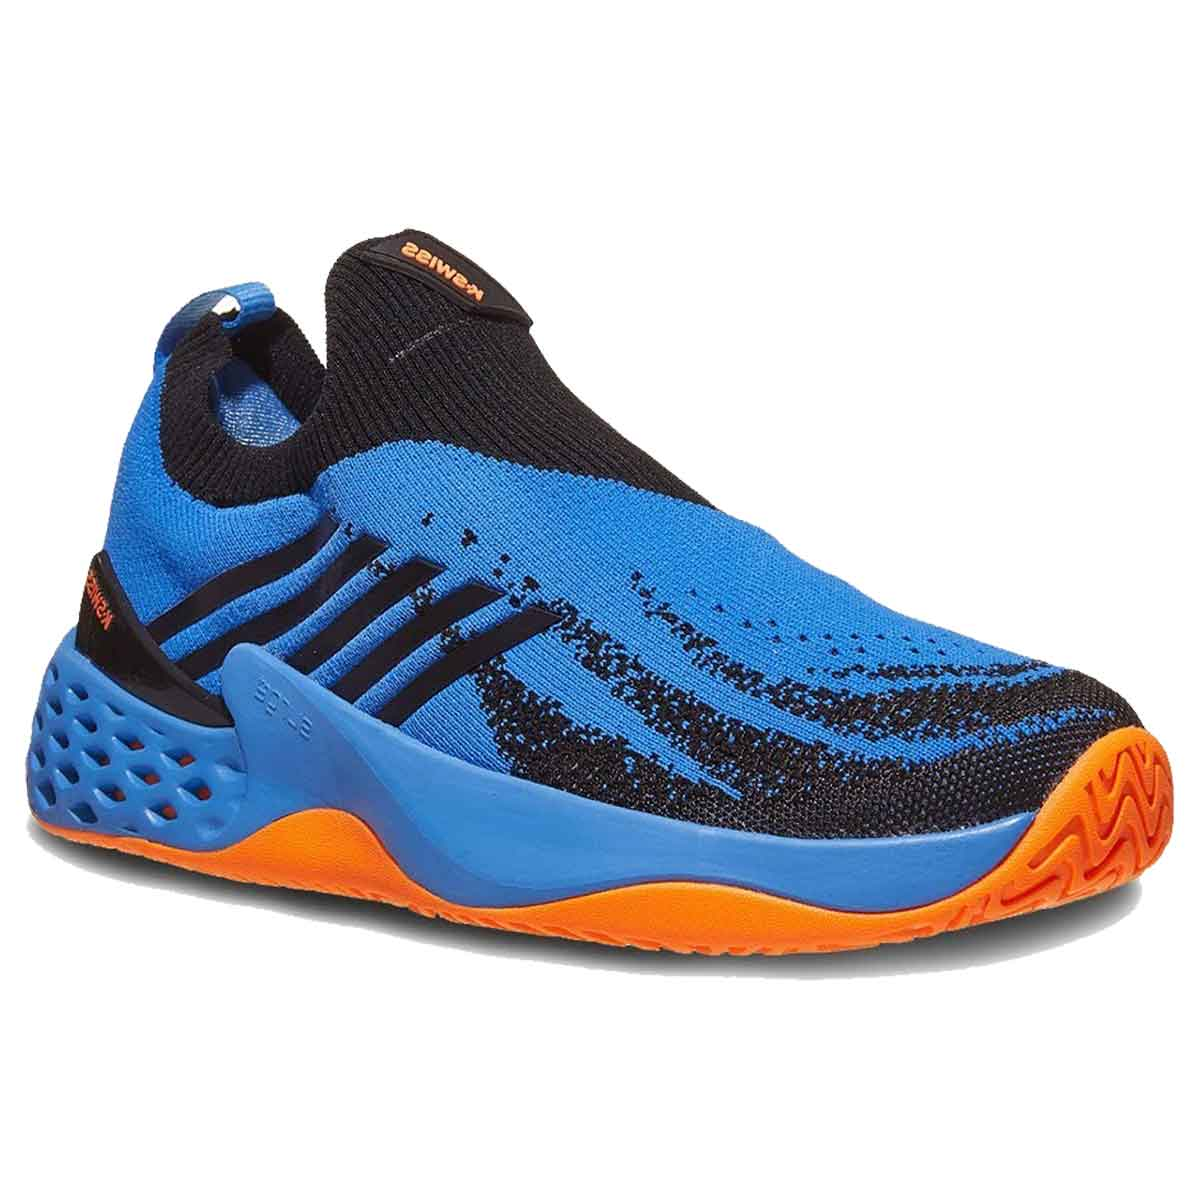 Buy K Swiss Aero Knit Mens Tennis Shoes